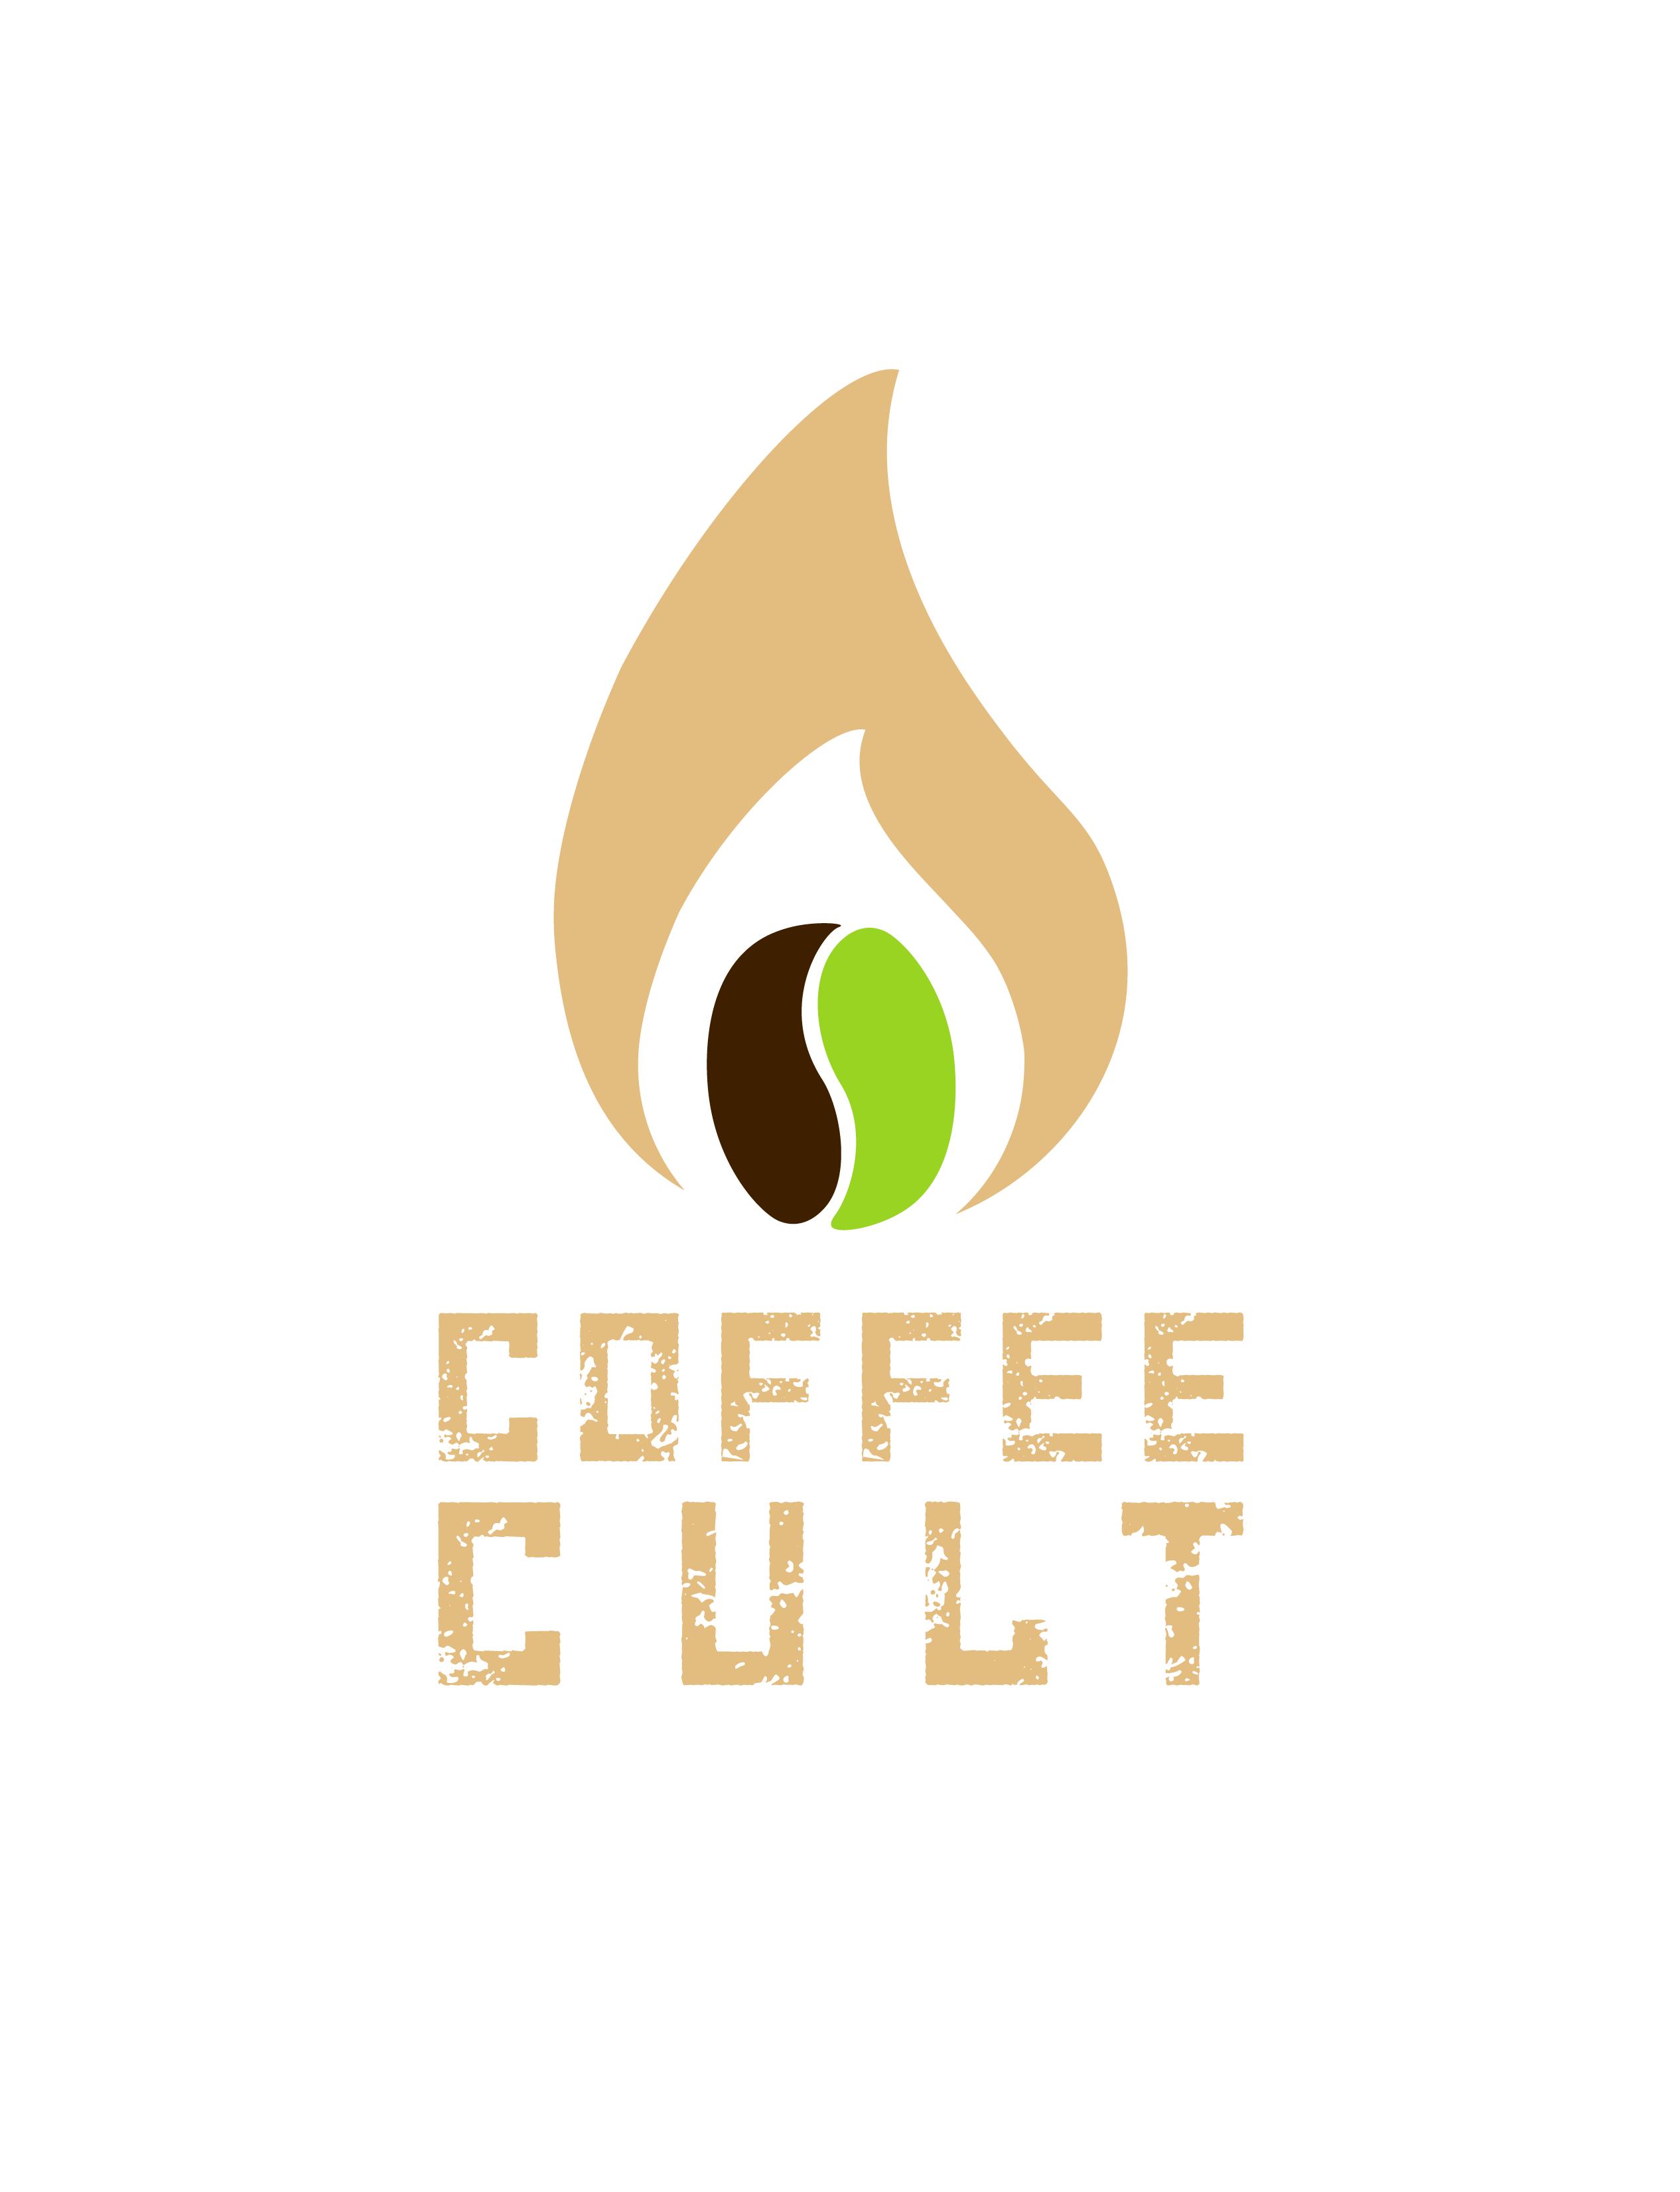 Логотип и фирменный стиль для компании COFFEE CULT фото f_2825bc200d78806f.png